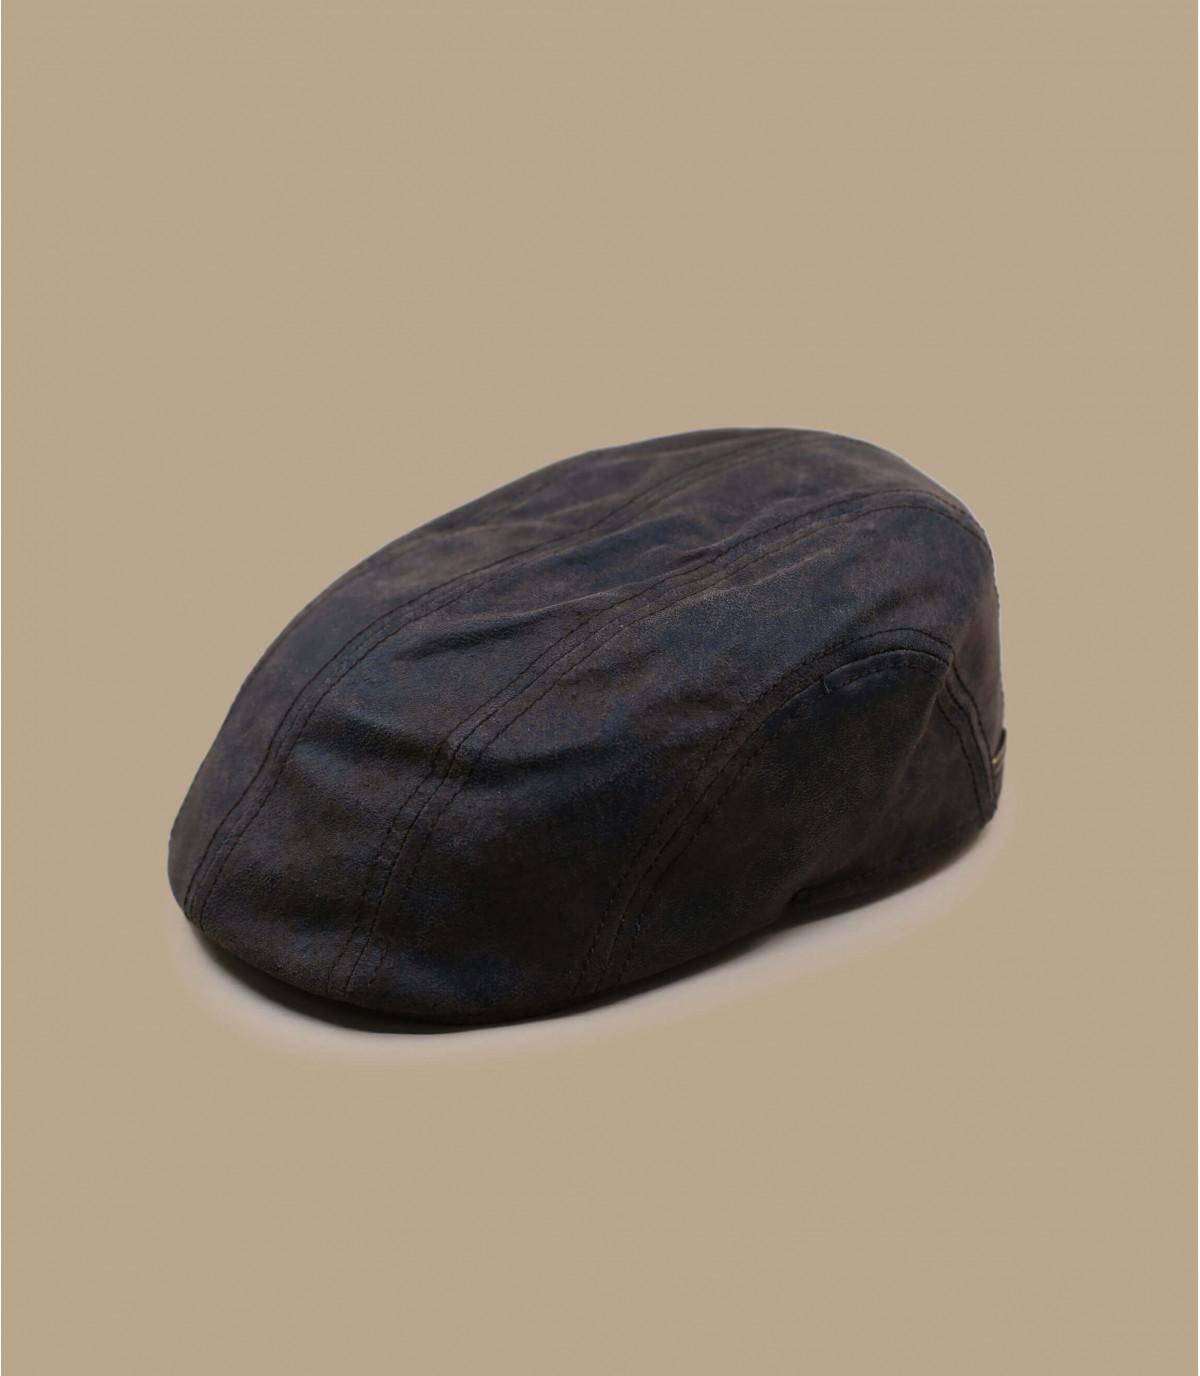 Stetson leather flat cap